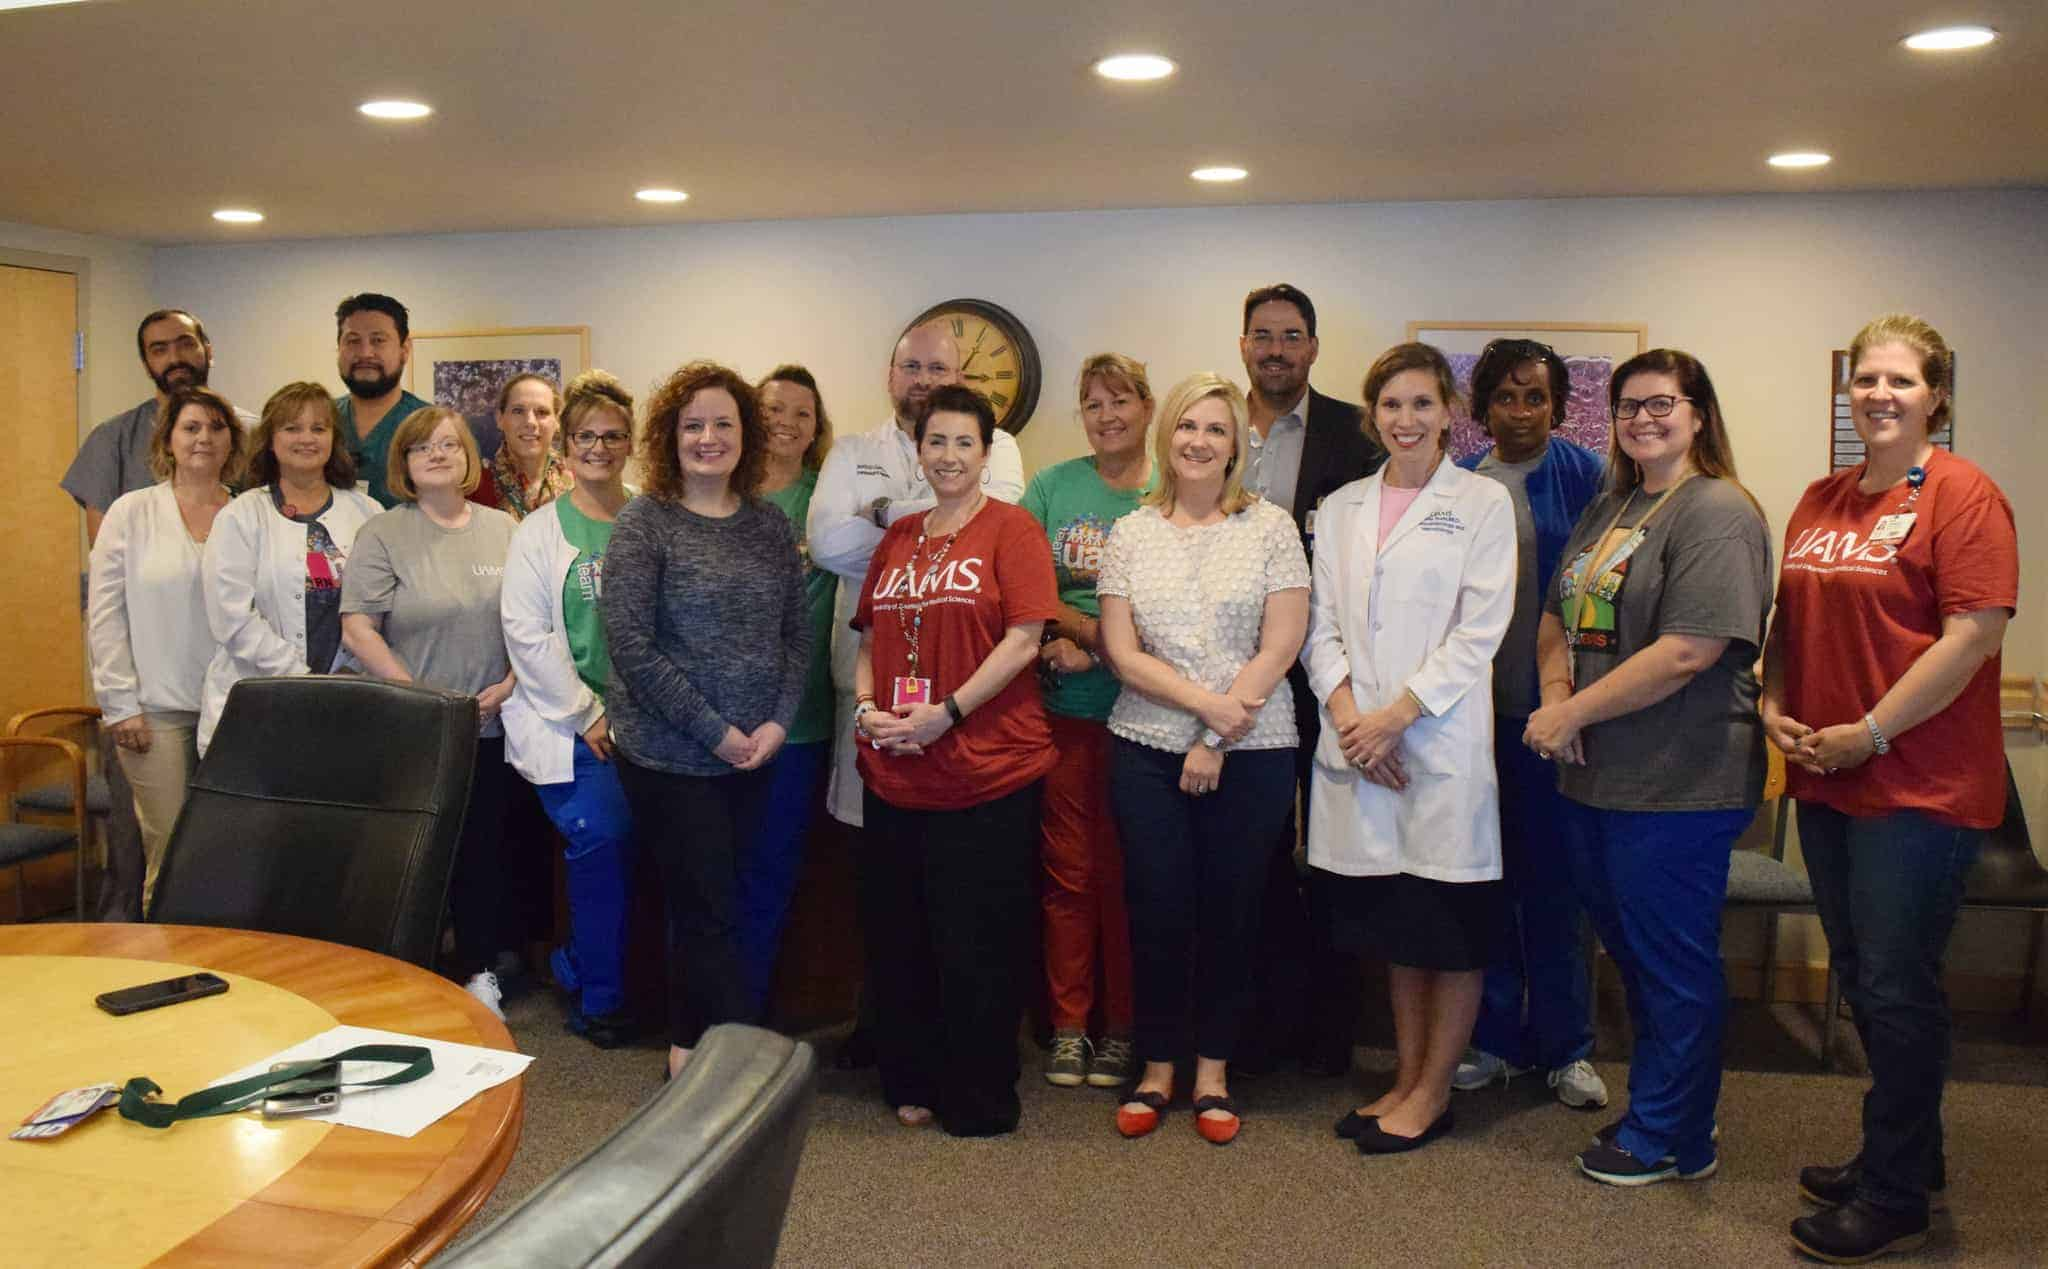 UAMS is home to the only liver transplant program in Arkansas. Pictured are (L-R front) Joy Cope, R.N.; Kim Gipson, B.S.N.; Leslie Kurczek, Pharm.D.; Brandi Barnhart, R.N.; Amanda Stevens, M.Sc.N., R.N.,; Stephanie Thomson; Holly Trotta, D.N.P., R.N.; Katie Rude, M.D.; Larissa Ivory, R.N.; Felicia Allard, M.D.; (L-R, back) Emmanouiil Giorgakis, M.D; Gerardo Tamayo-Enriquez, M.D.; Karen Johnson; Kelly Wilson; Mauricio Garcia, M.D.; Denice Roberts; Lyle Burdine, M.D.; and Kim Marcus.